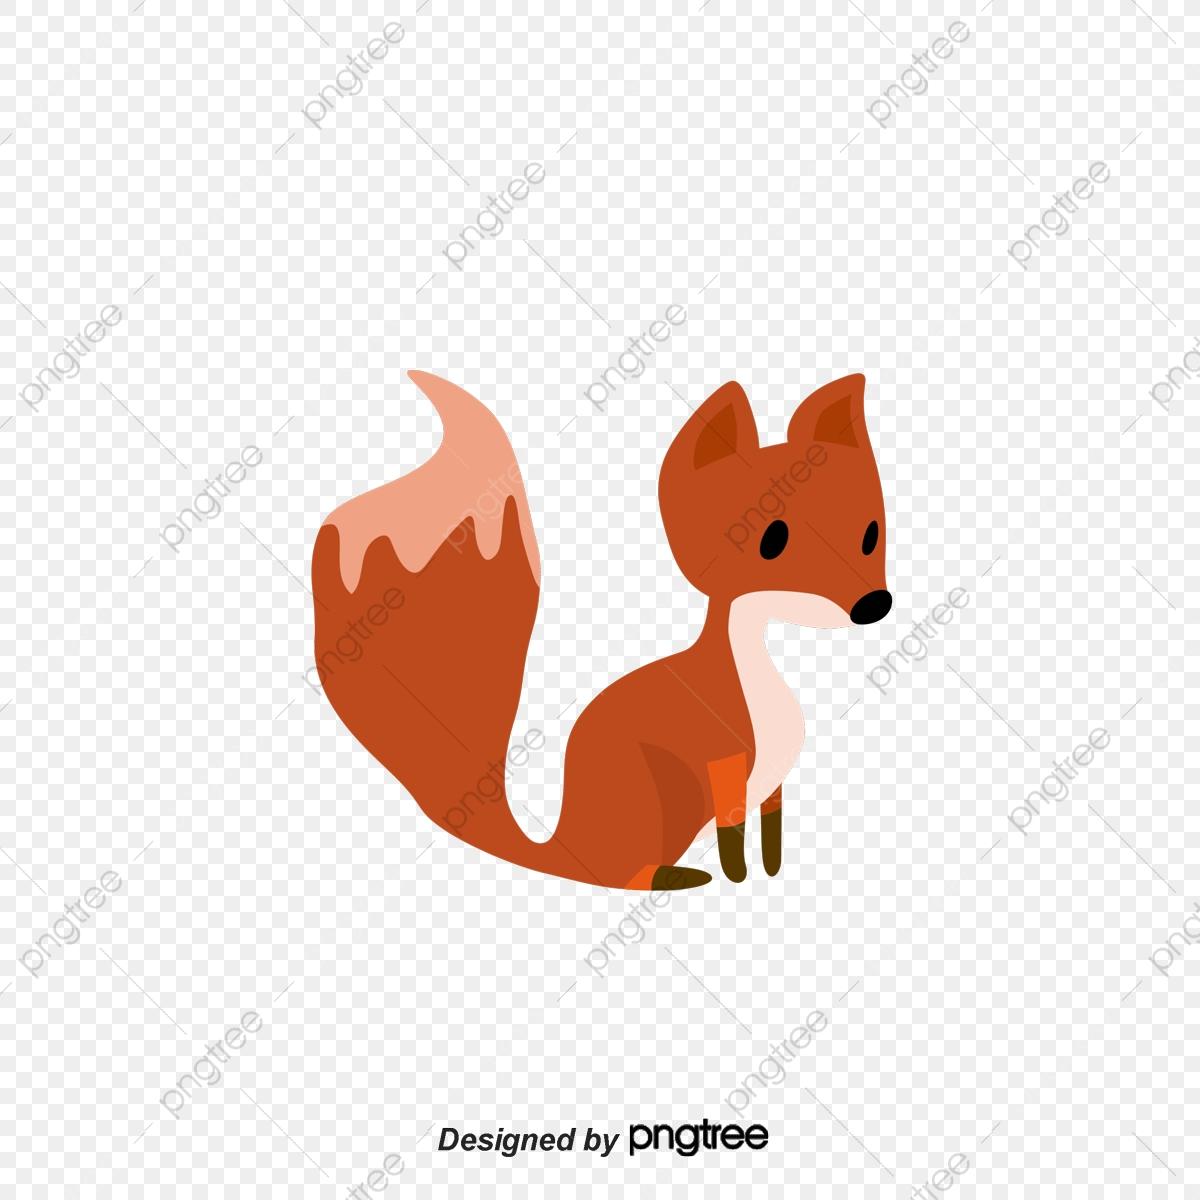 Cartoon Fox Vector, Cartoon Animal, Cartoon Hand Drawing, Decorative.